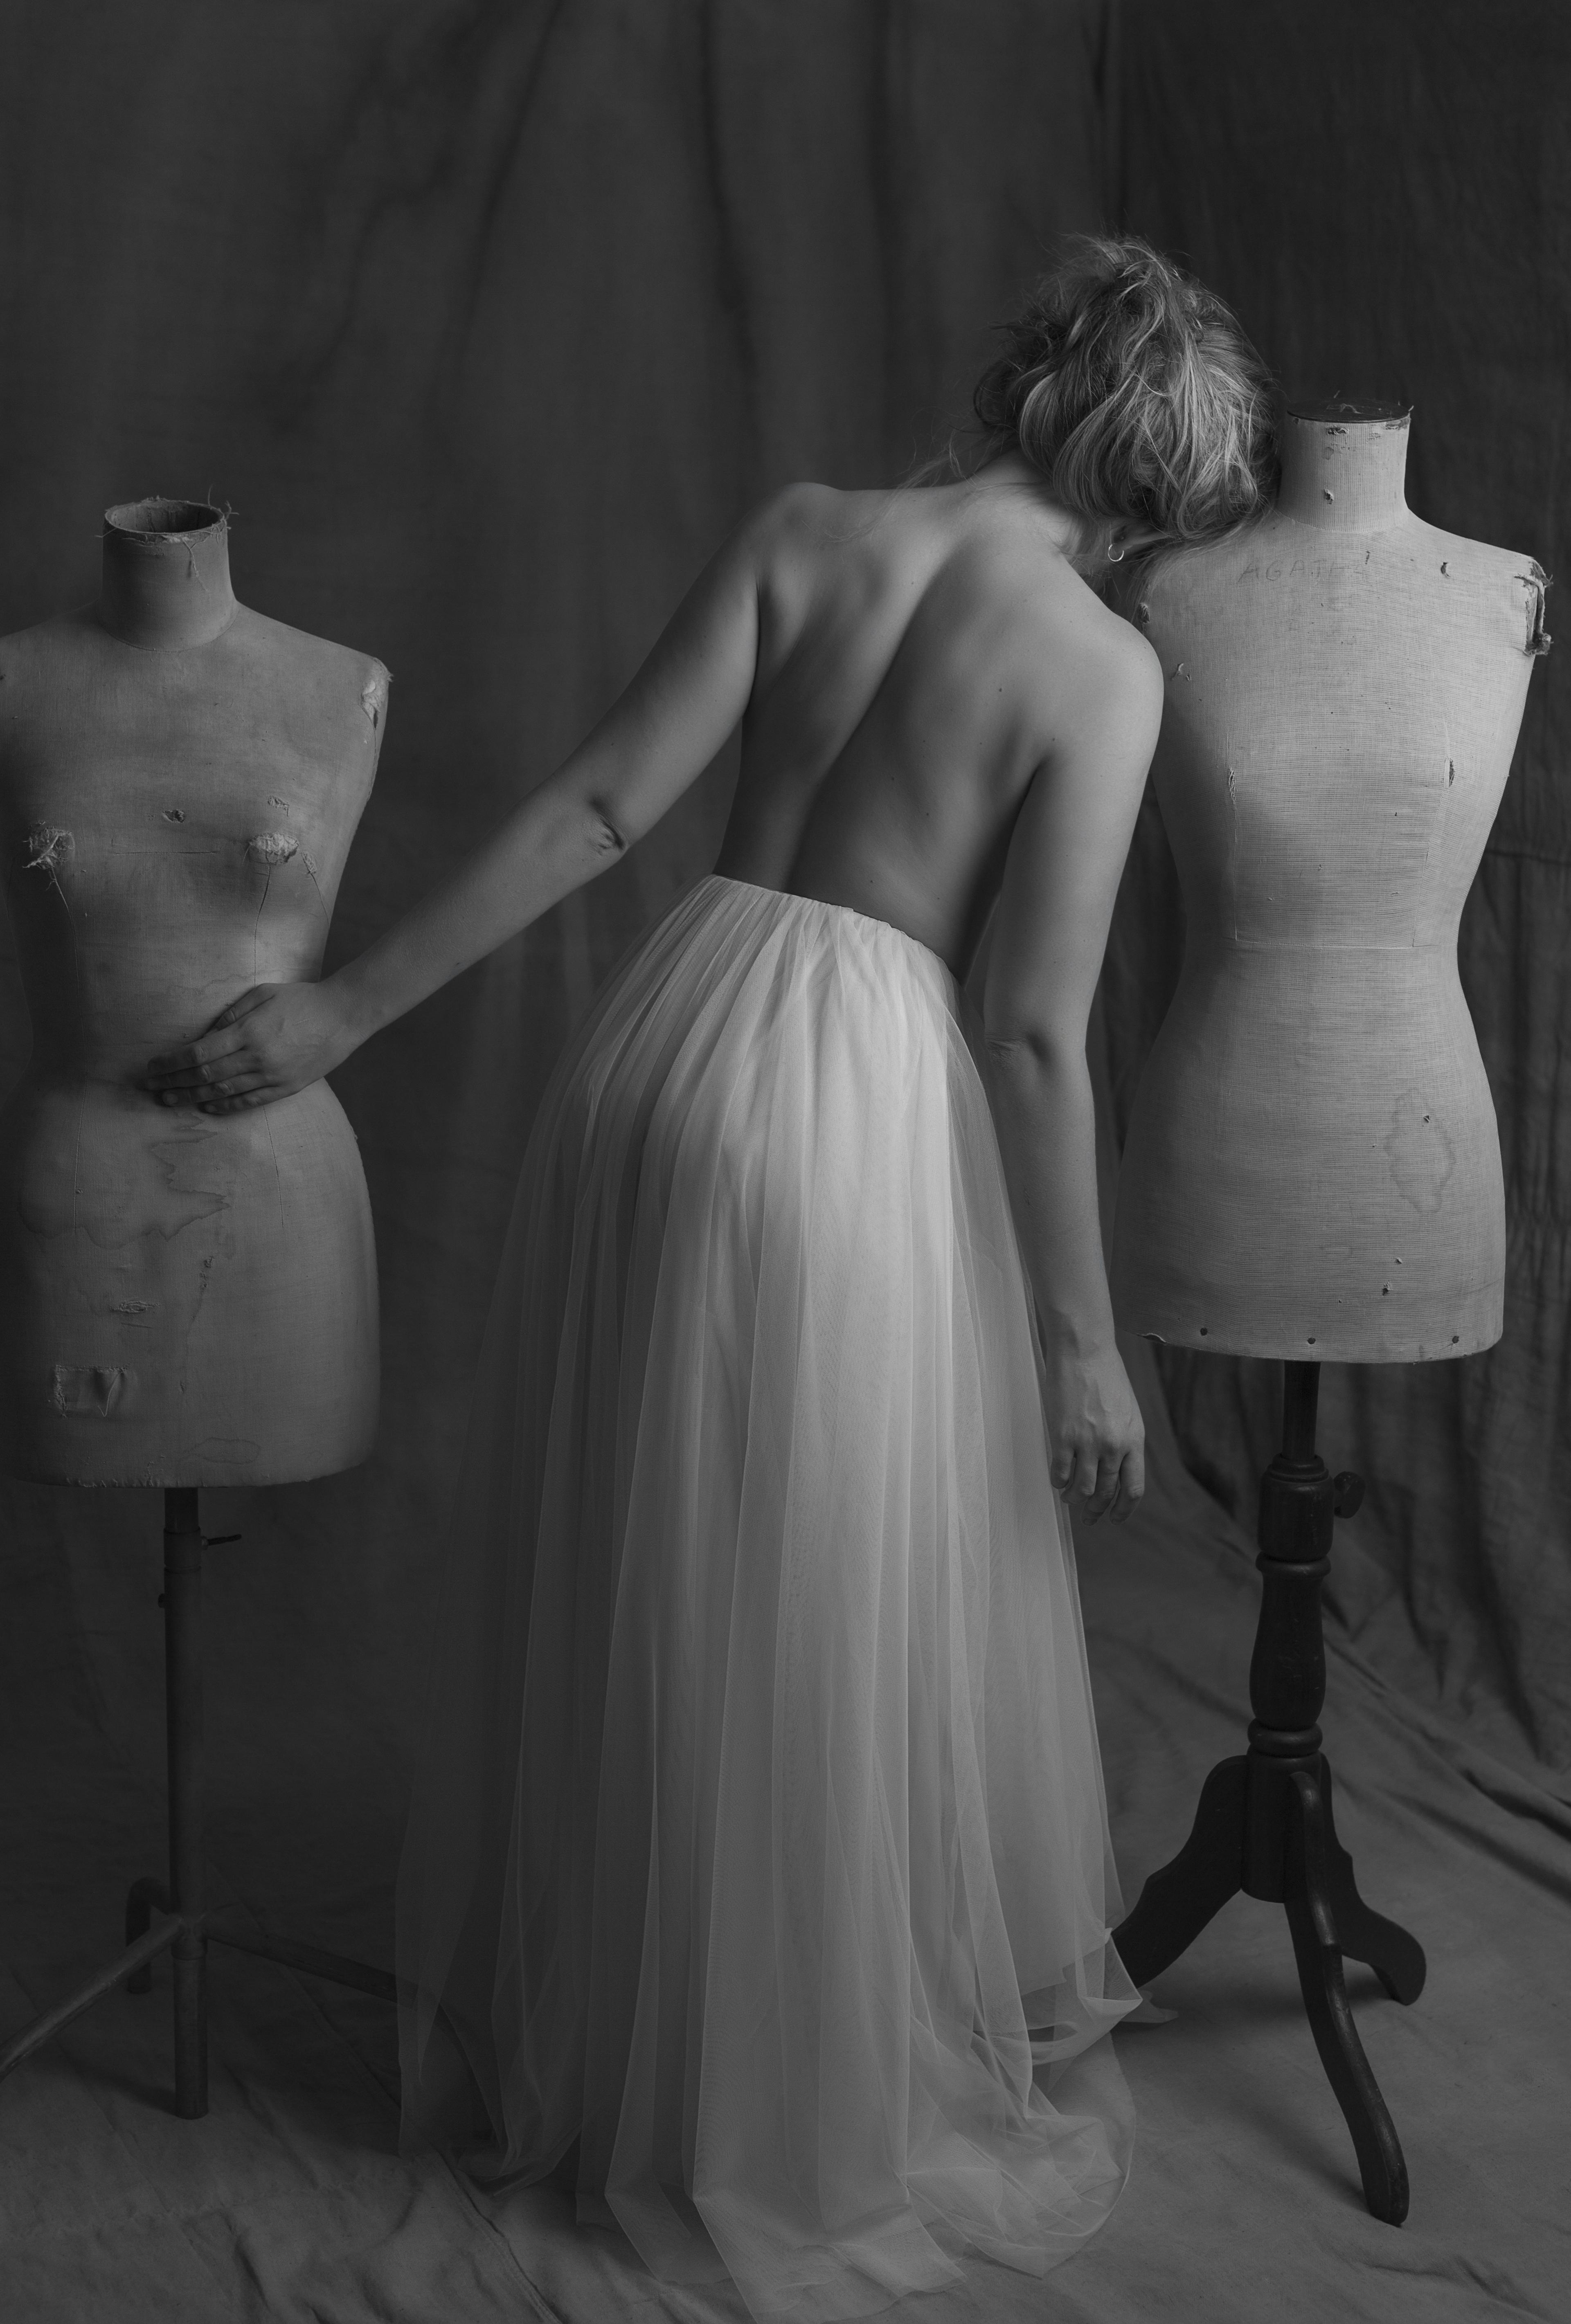 The Dressmaker's Room